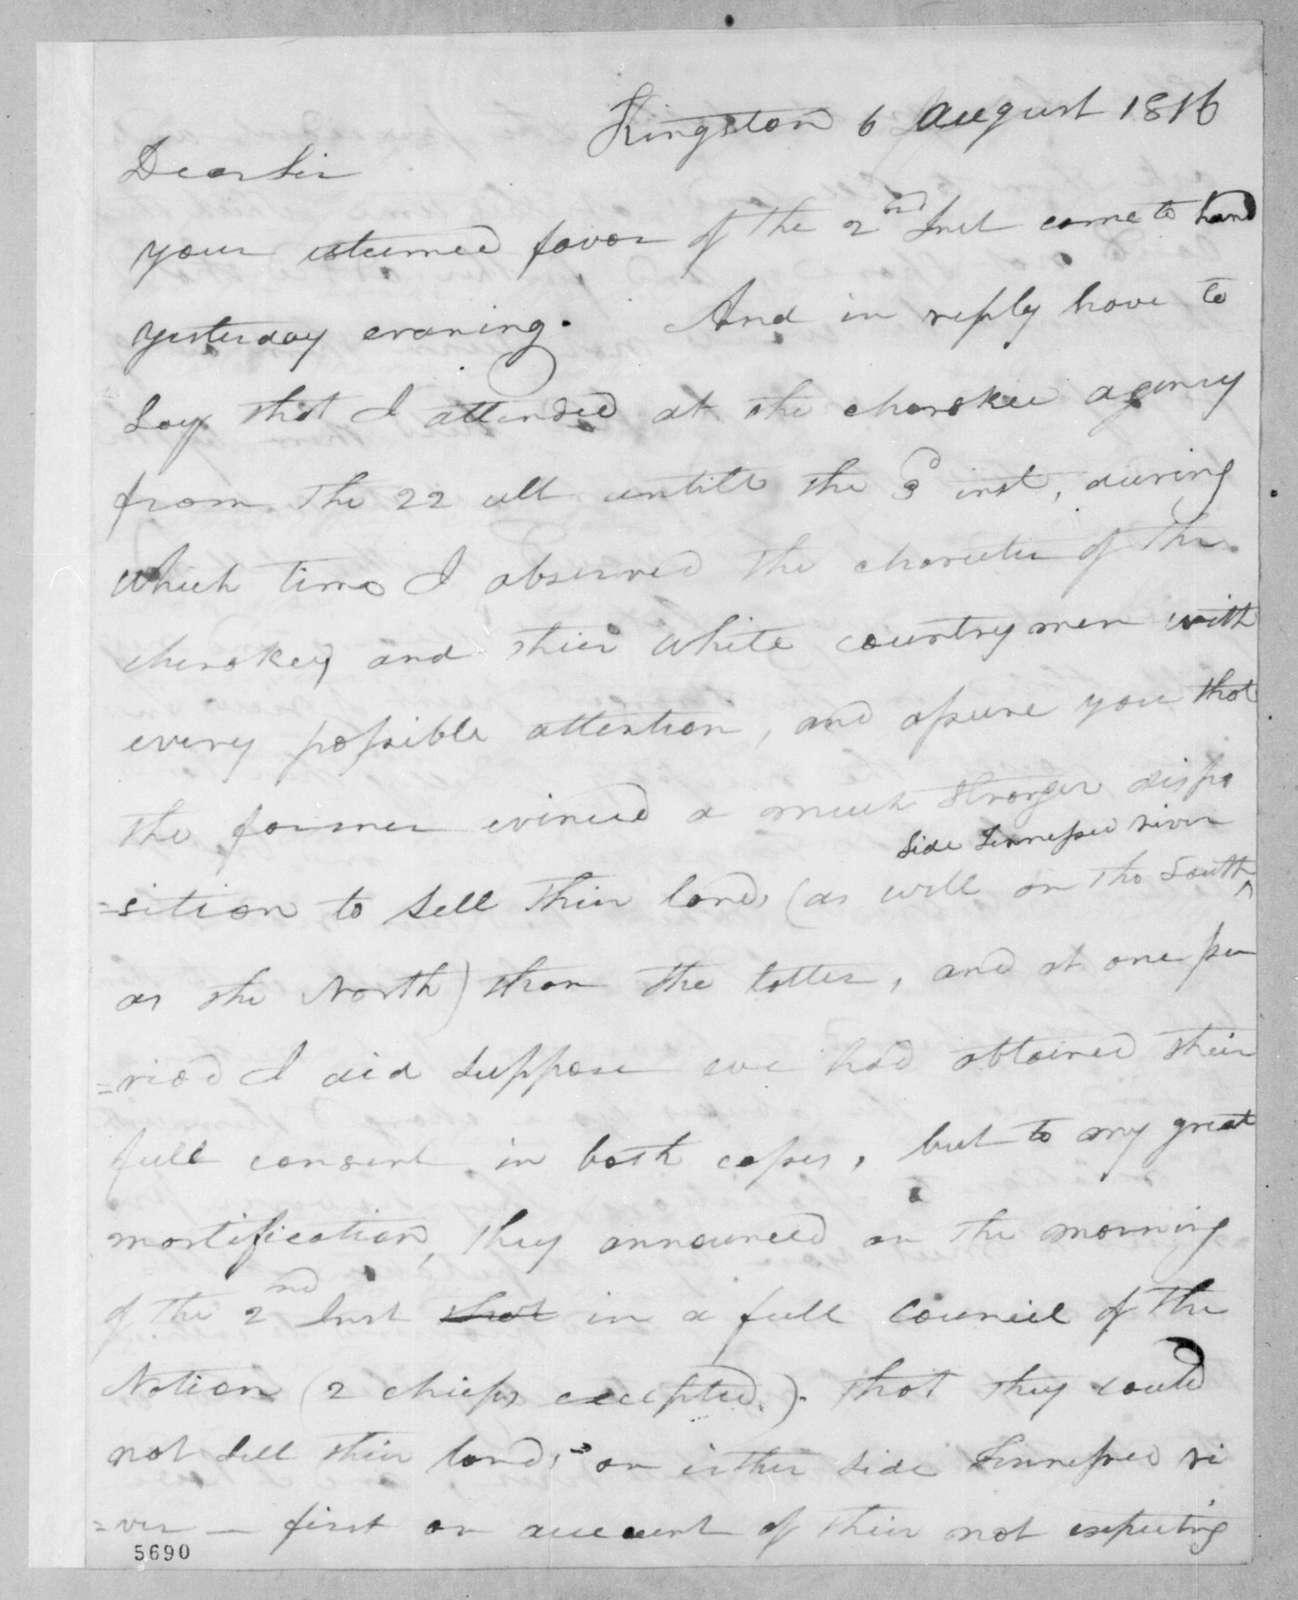 Joseph McMinn to Andrew Jackson, August 6, 1816